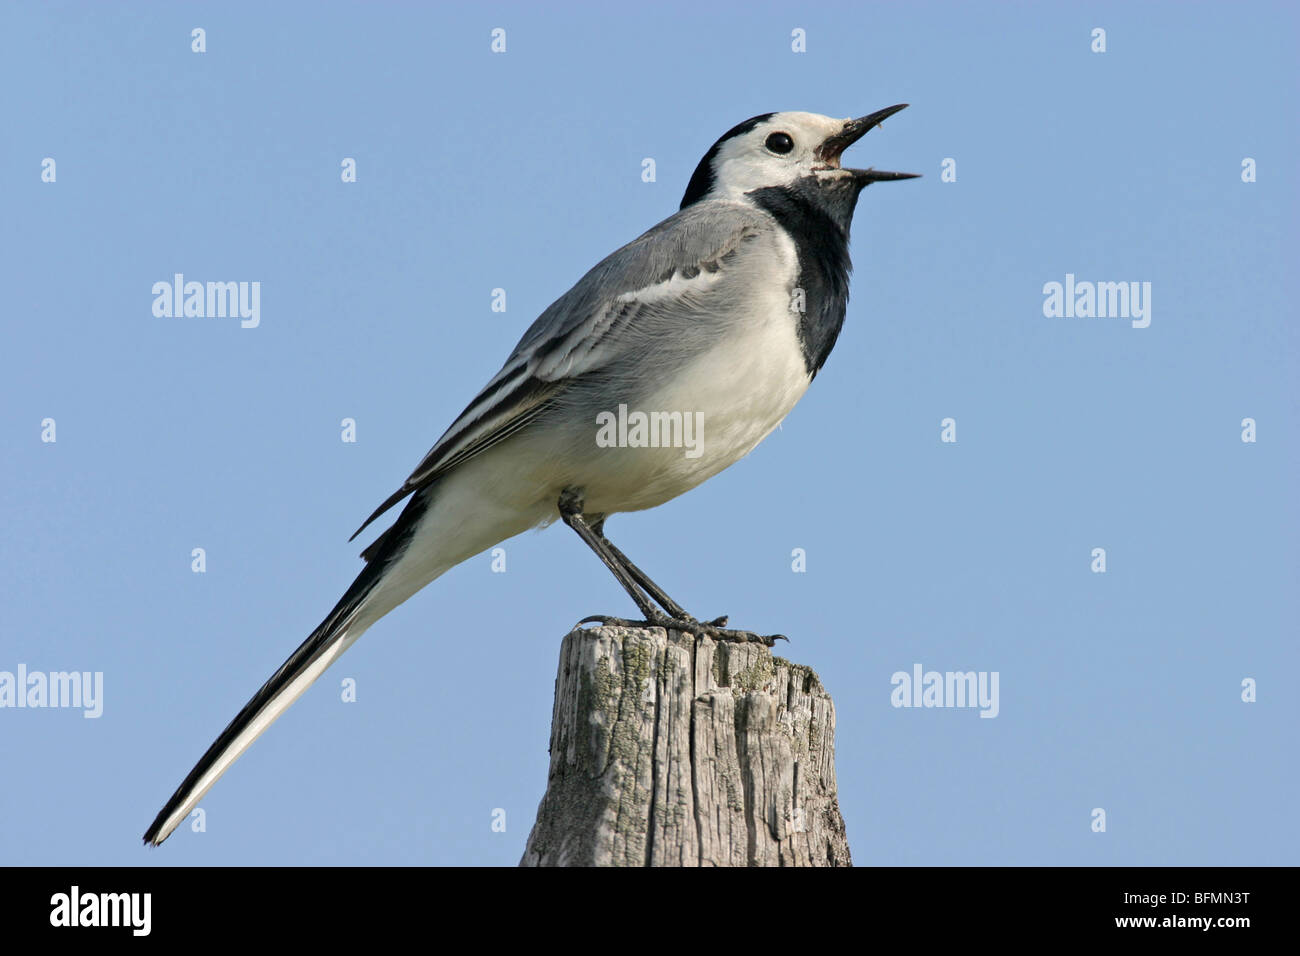 pied wagtail (Motacilla alba), on post singing, Germany - Stock Image